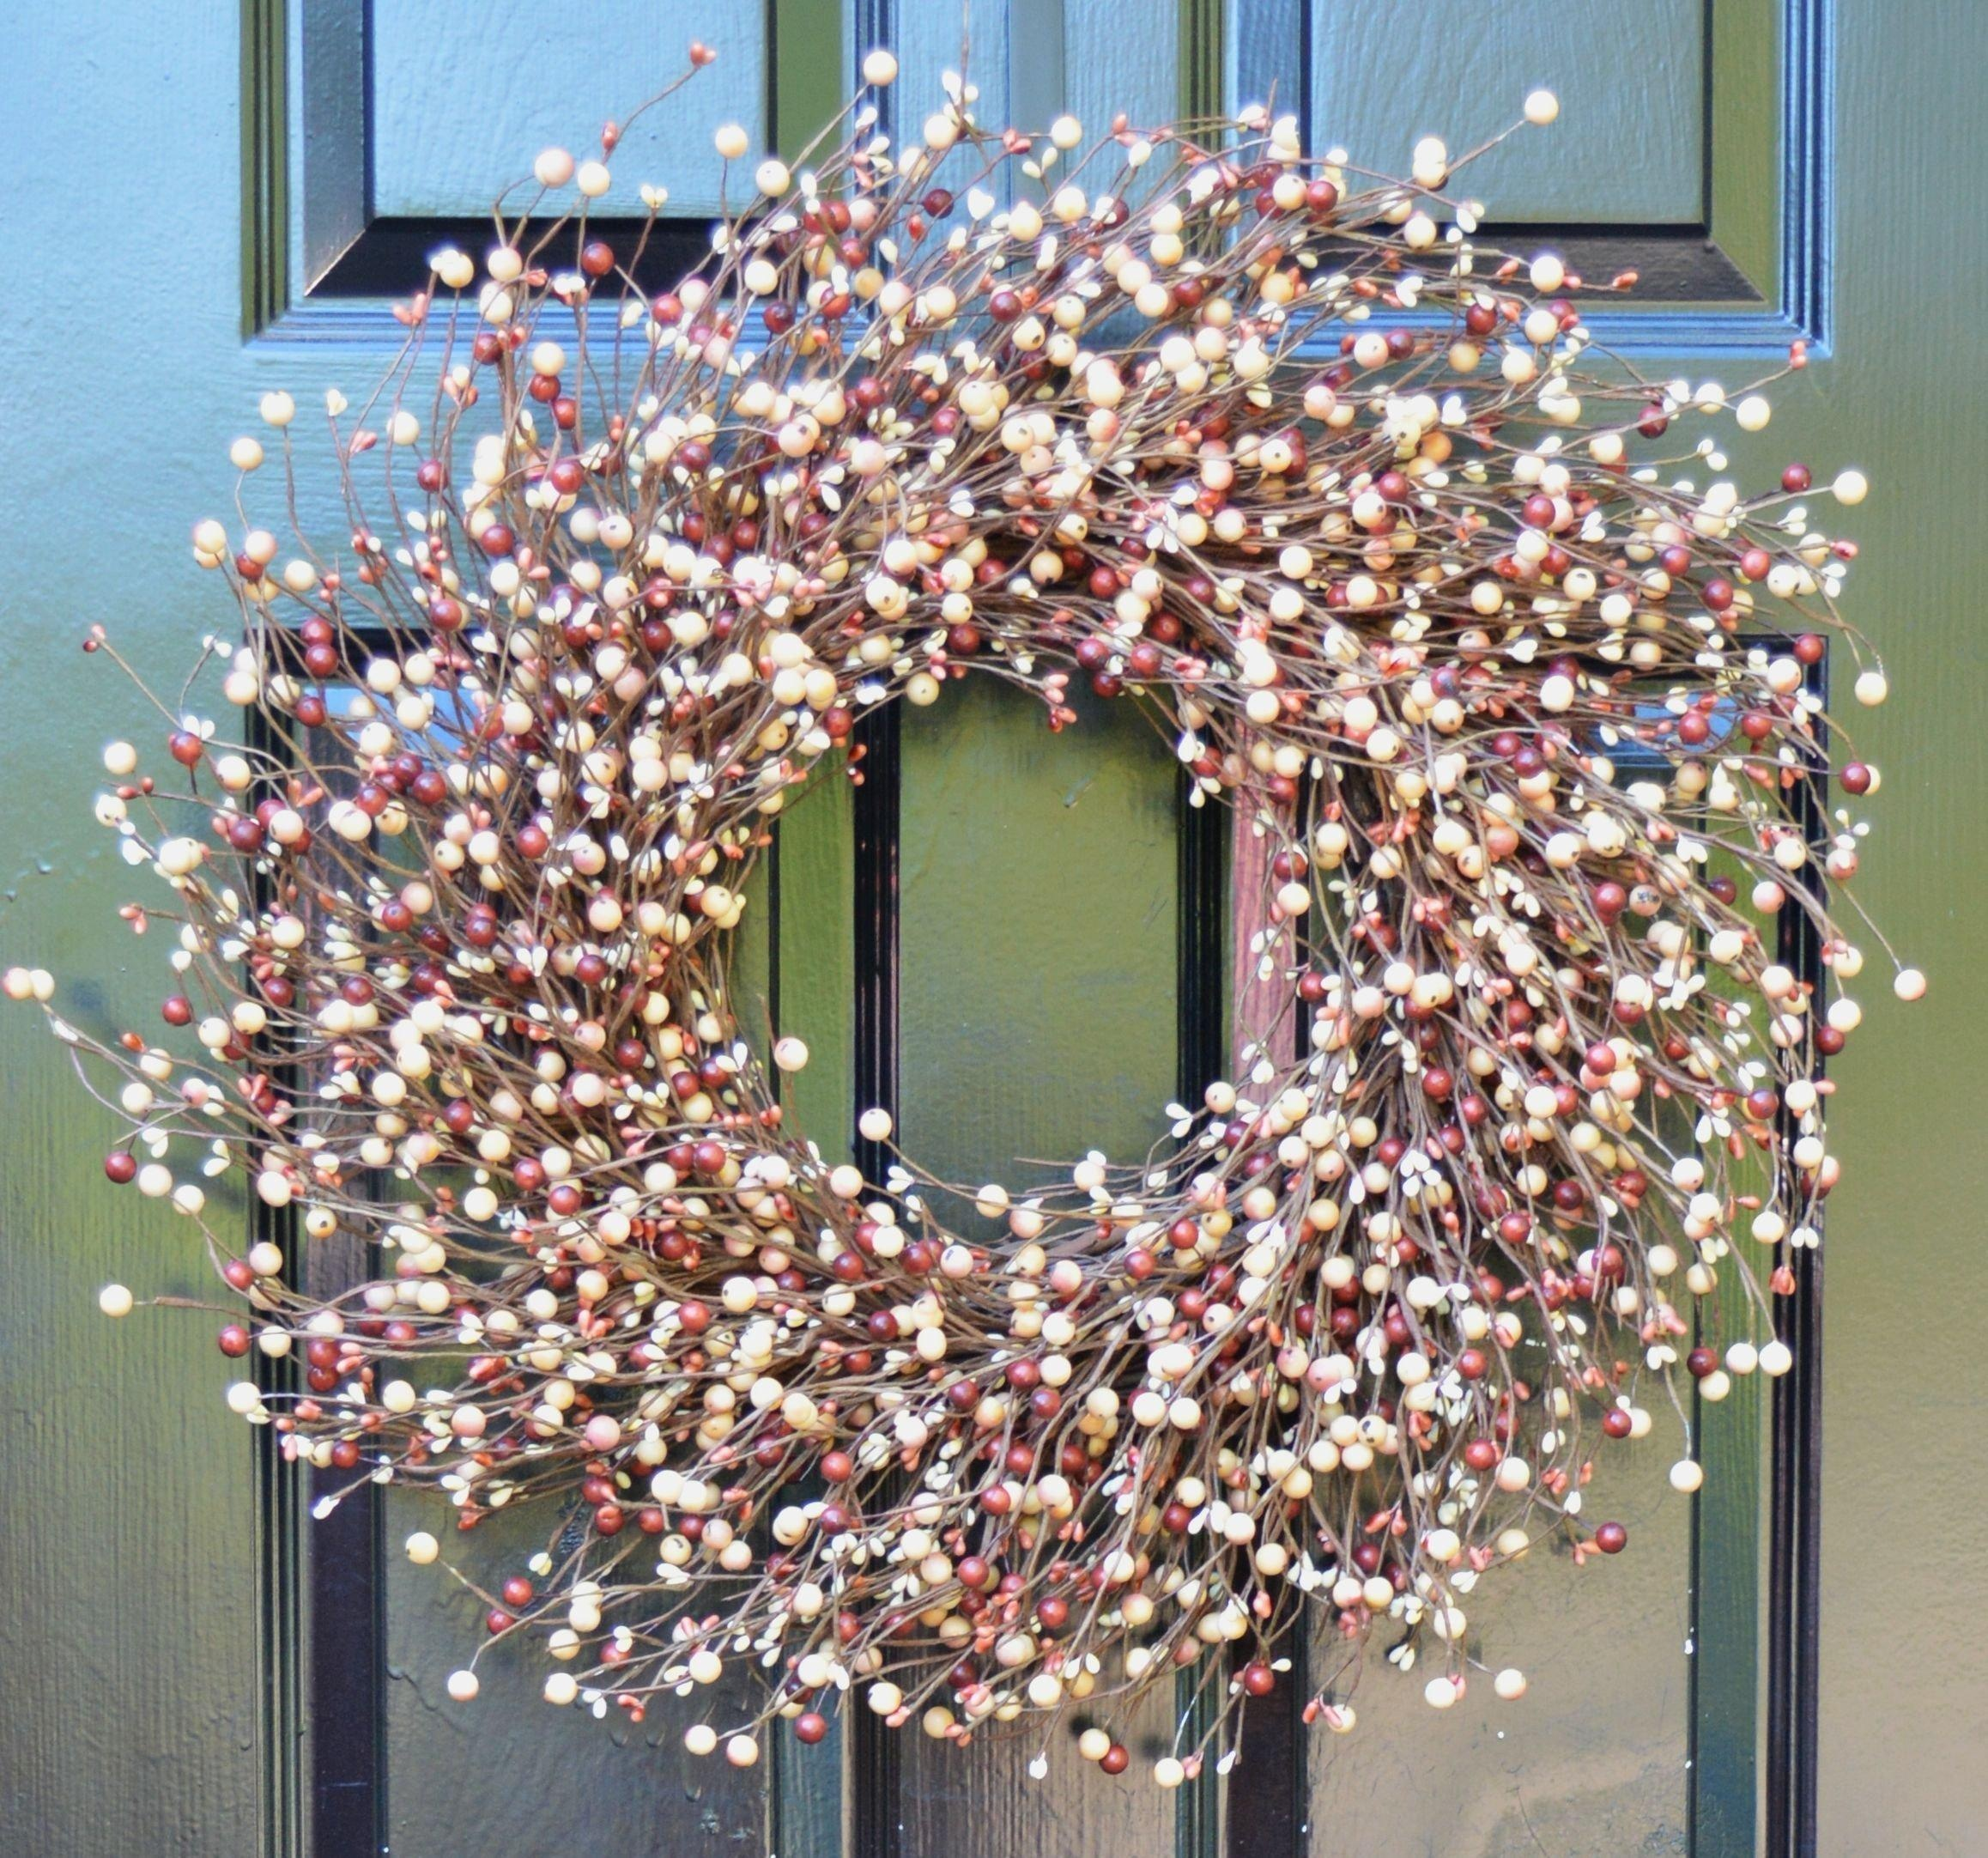 Front door decor for all seasons - Elegant Holidays Handmade Burgundy Berry Wreath Decorative Front Door To Welcome Guests For Outdoor